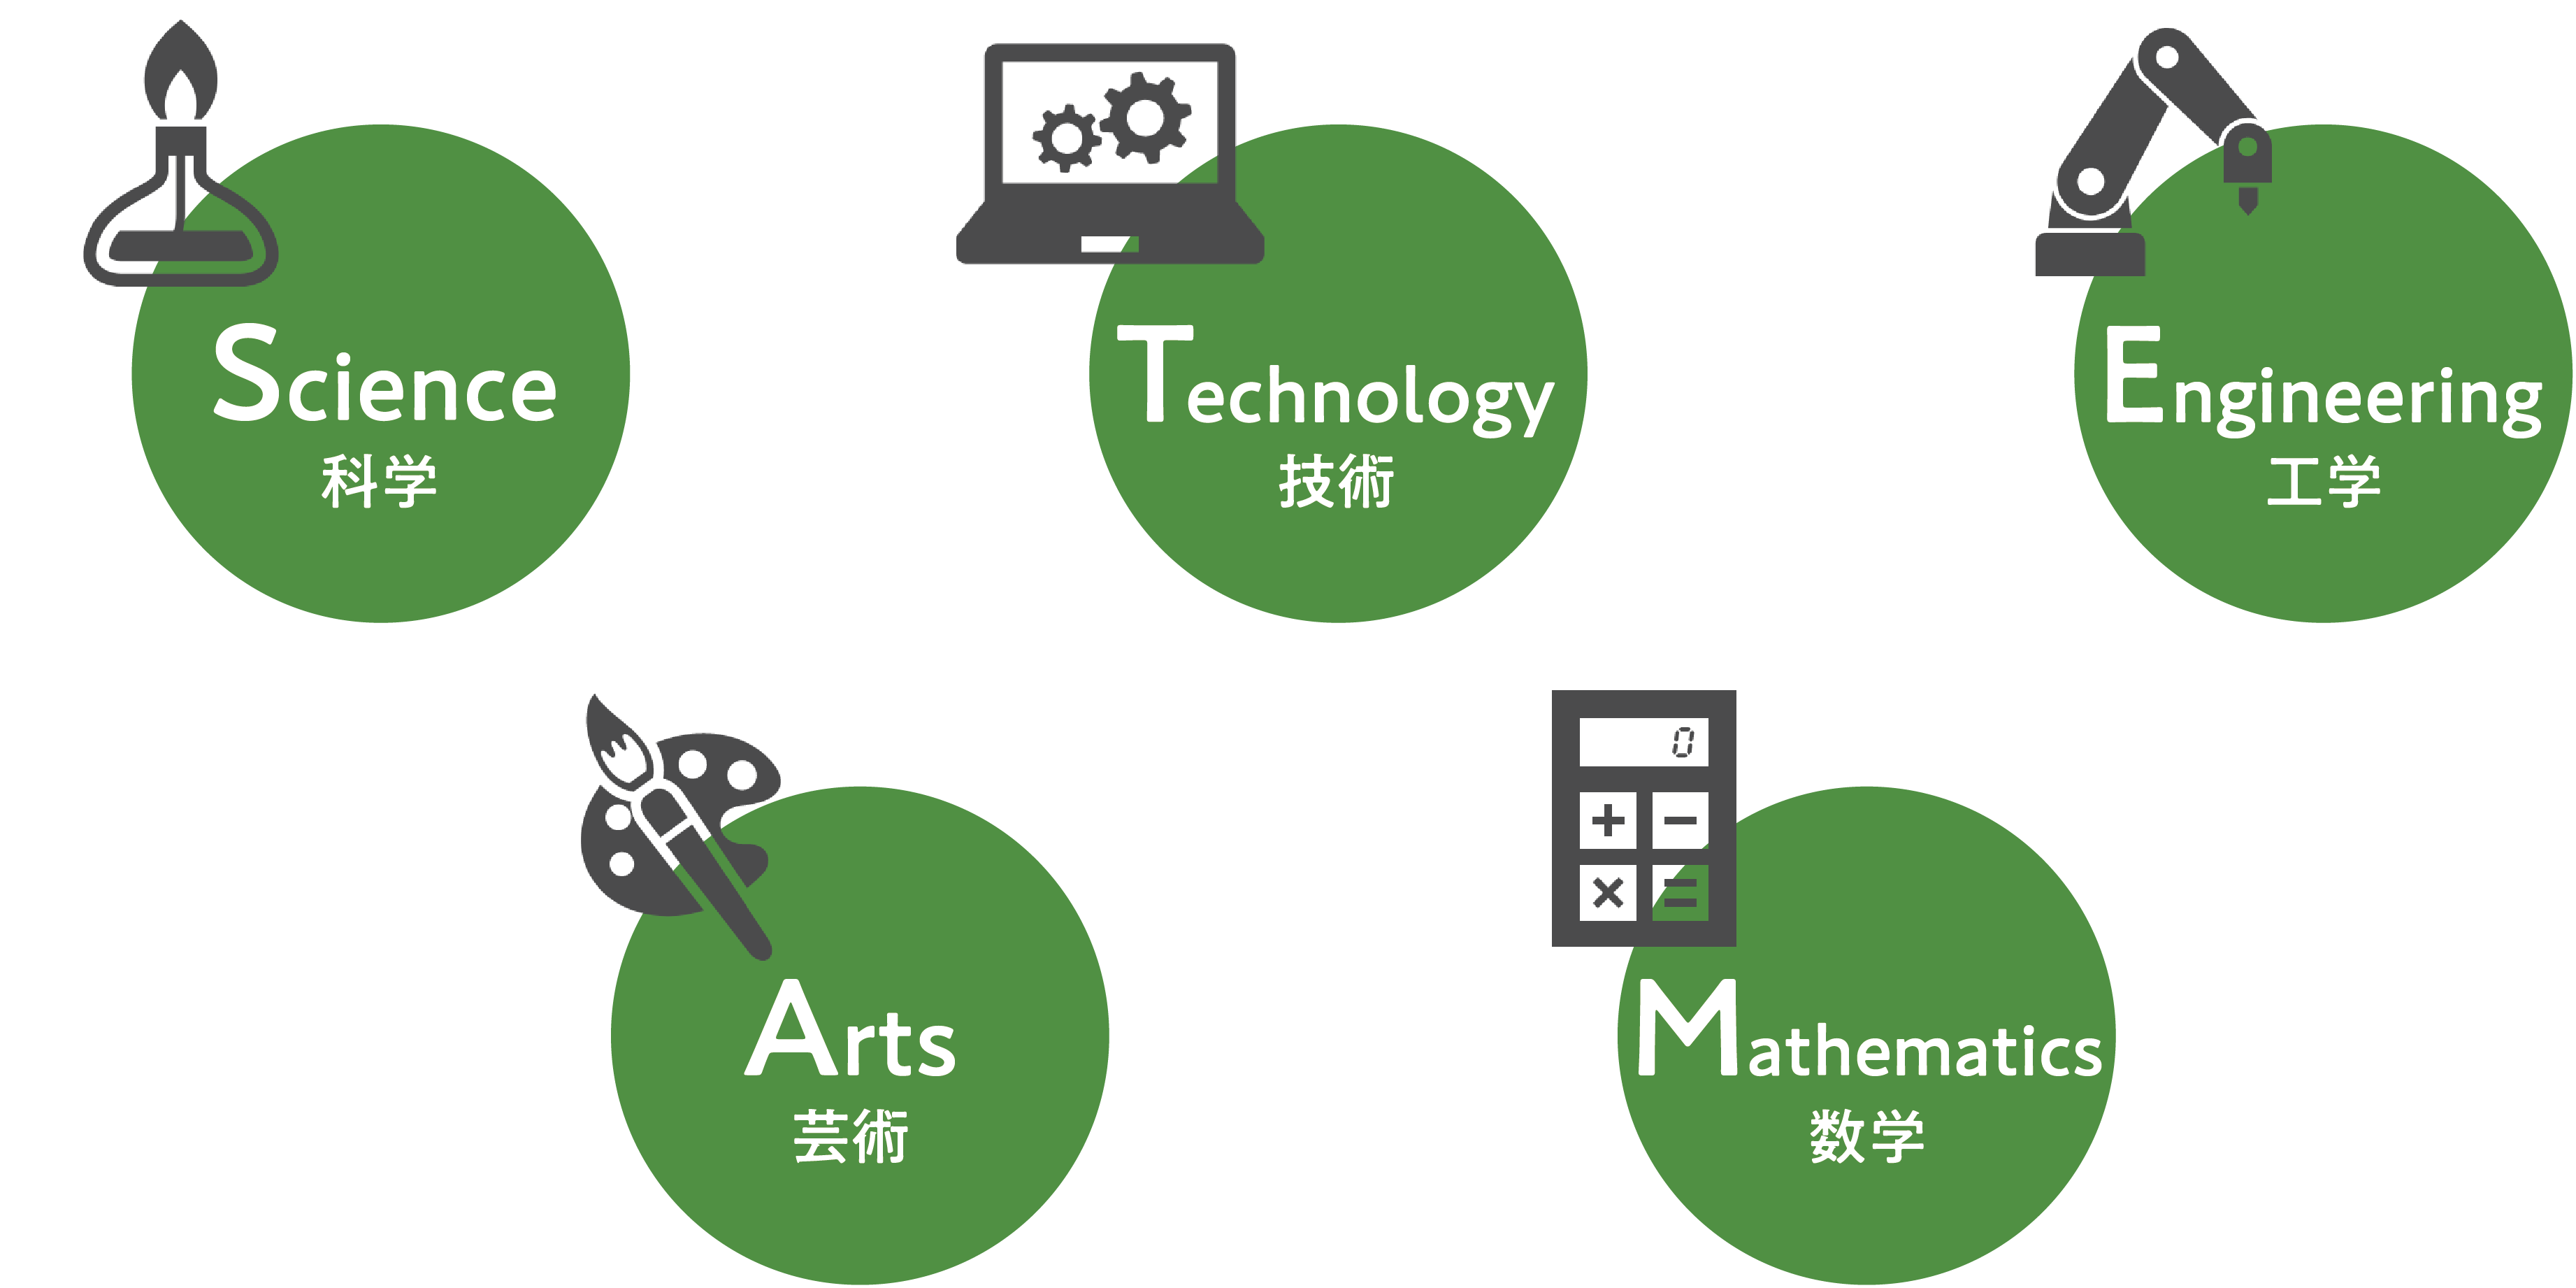 Science,Technology,Engineering,Arts,Mathematics